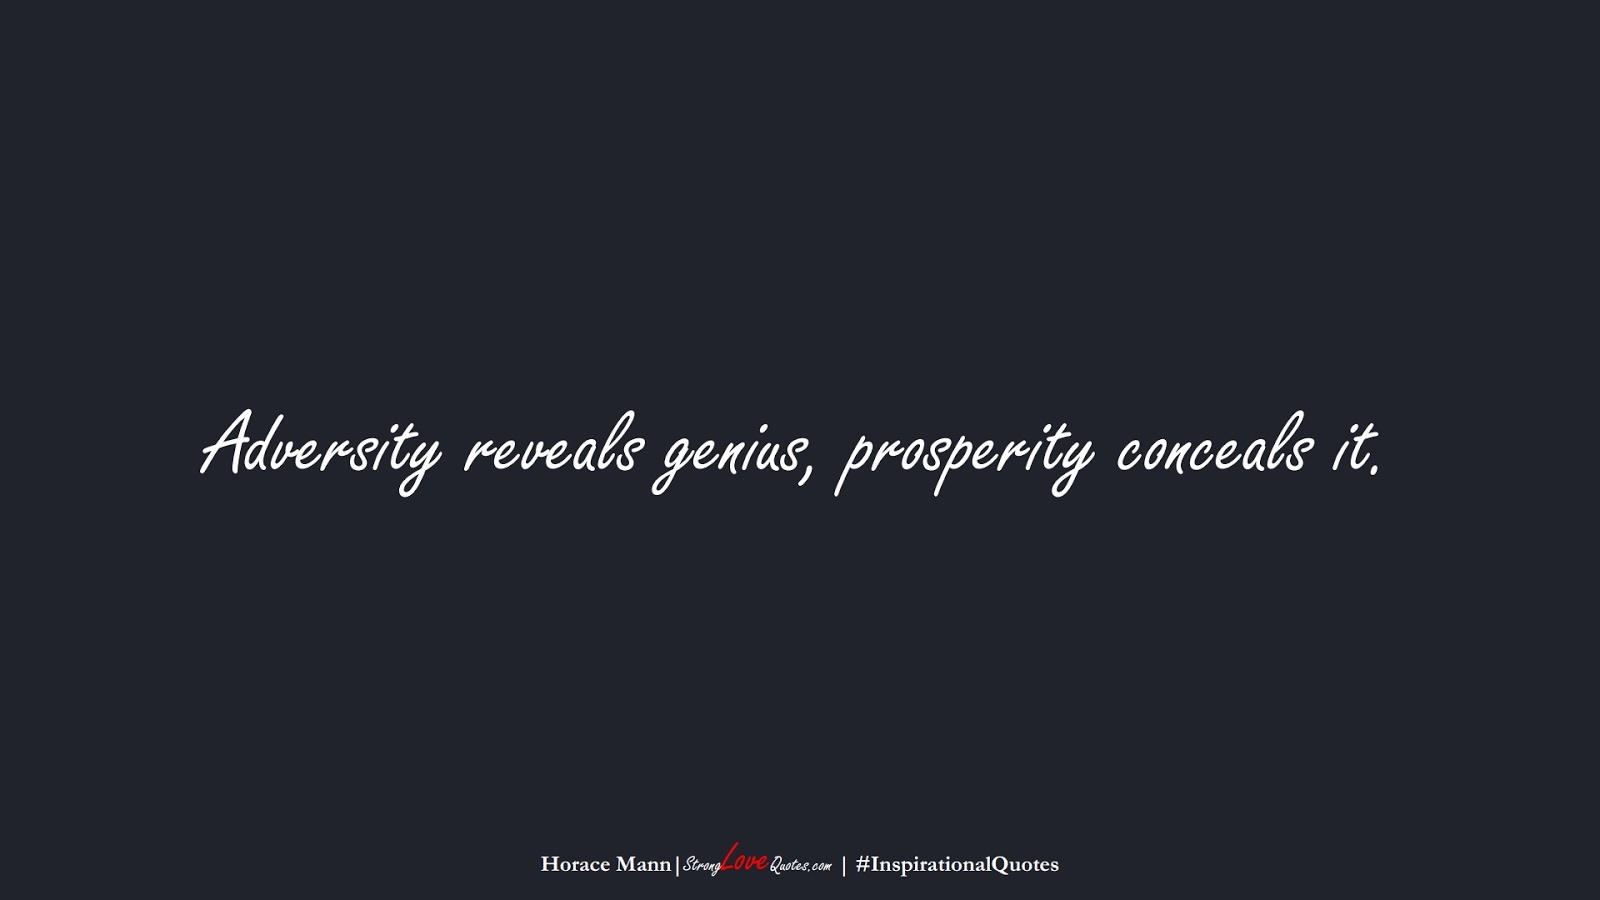 Adversity reveals genius, prosperity conceals it. (Horace Mann);  #InspirationalQuotes